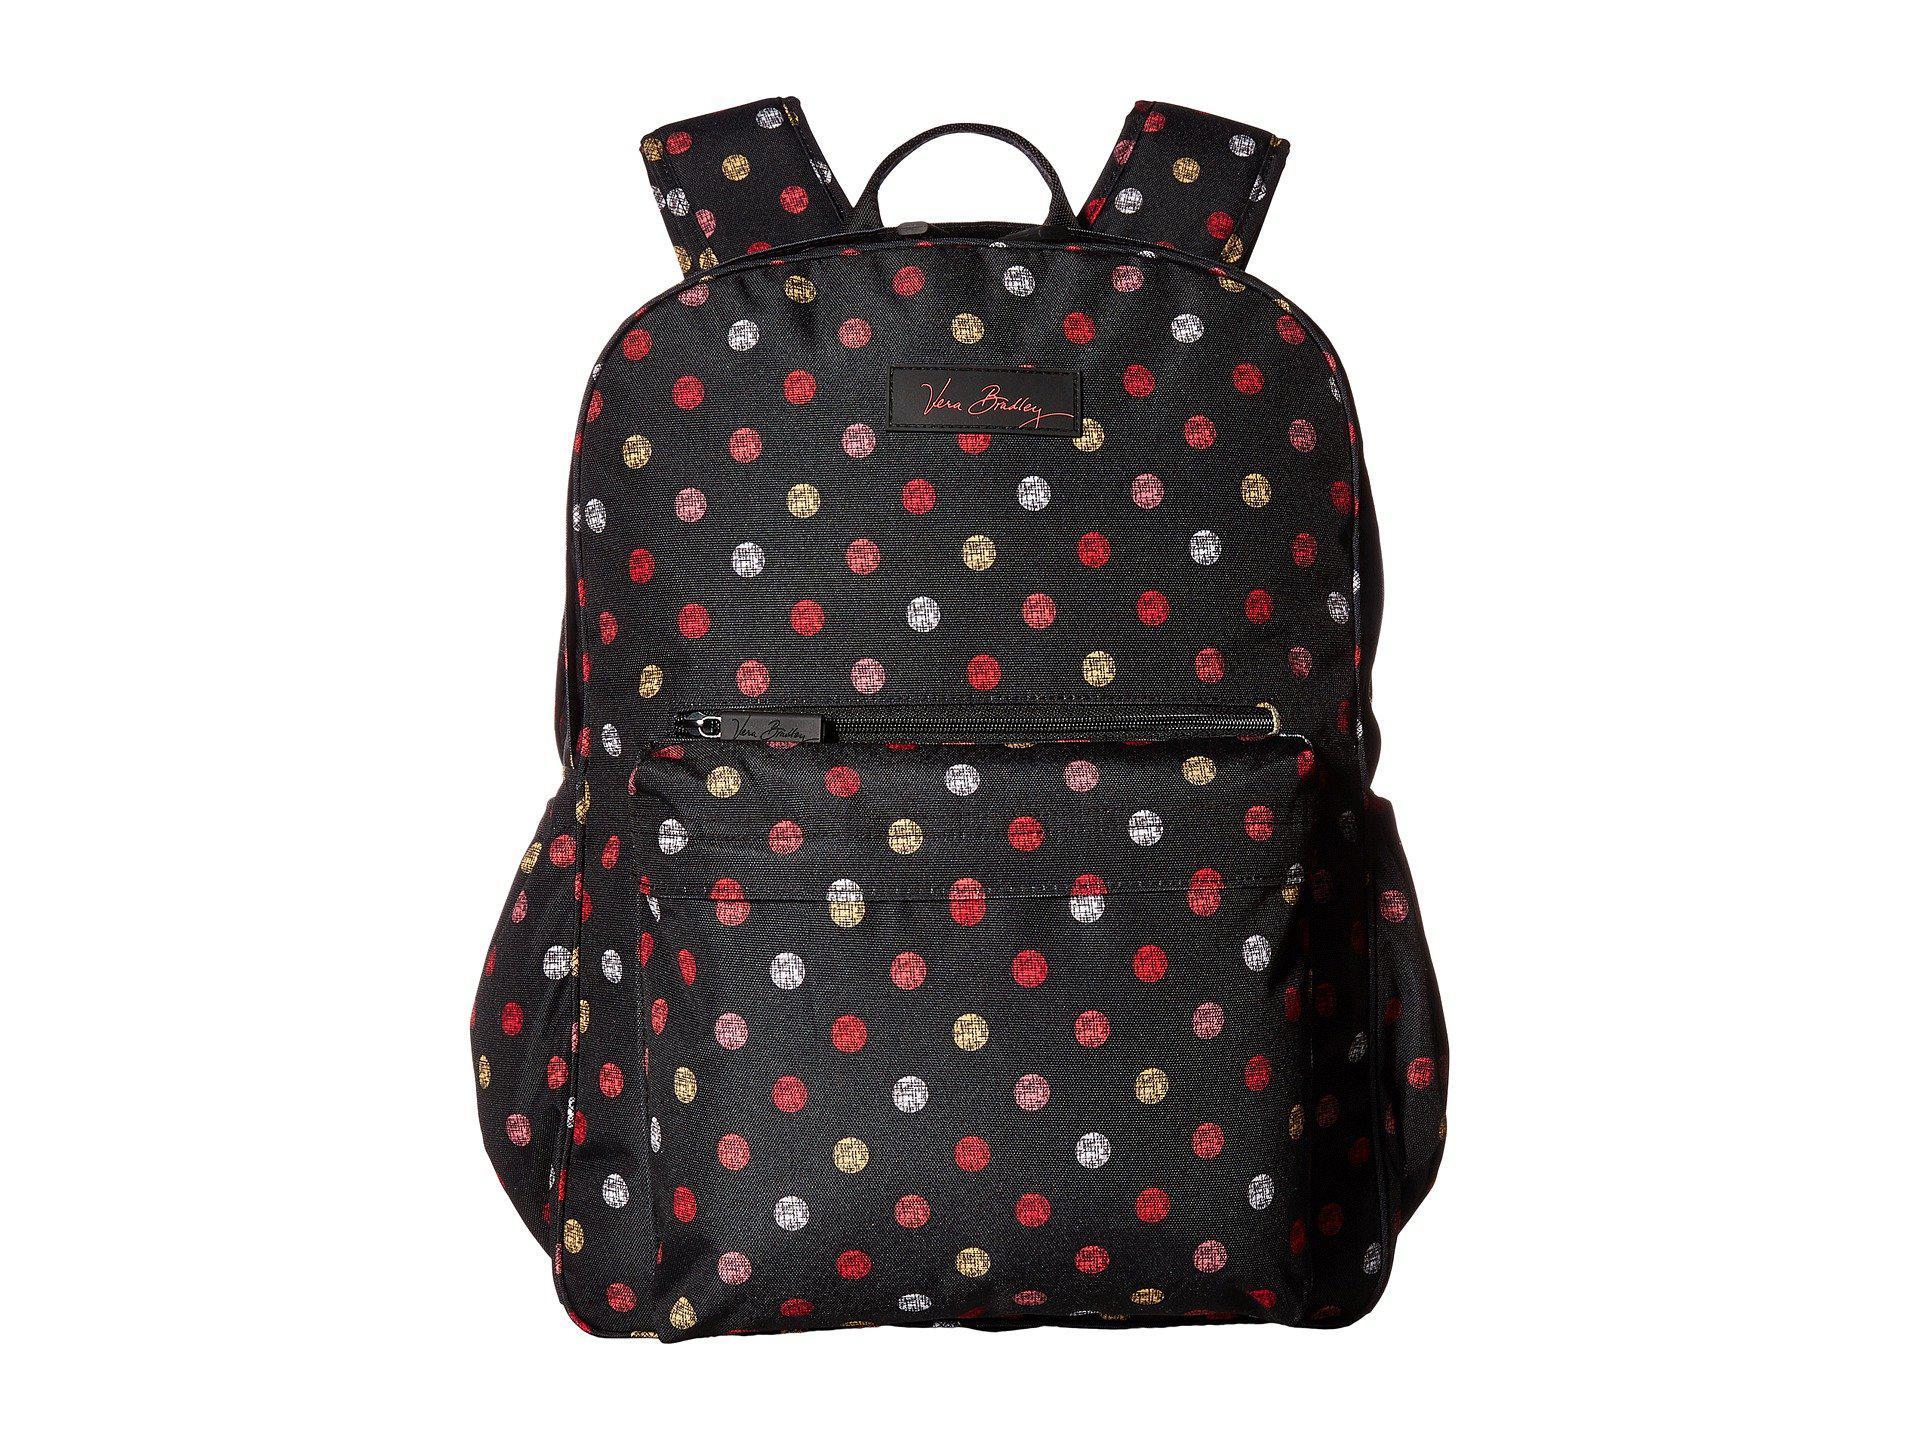 5e4389589a99 Lyst - Vera Bradley Lighten Up Grande Laptop Backpack (havana Dots ...